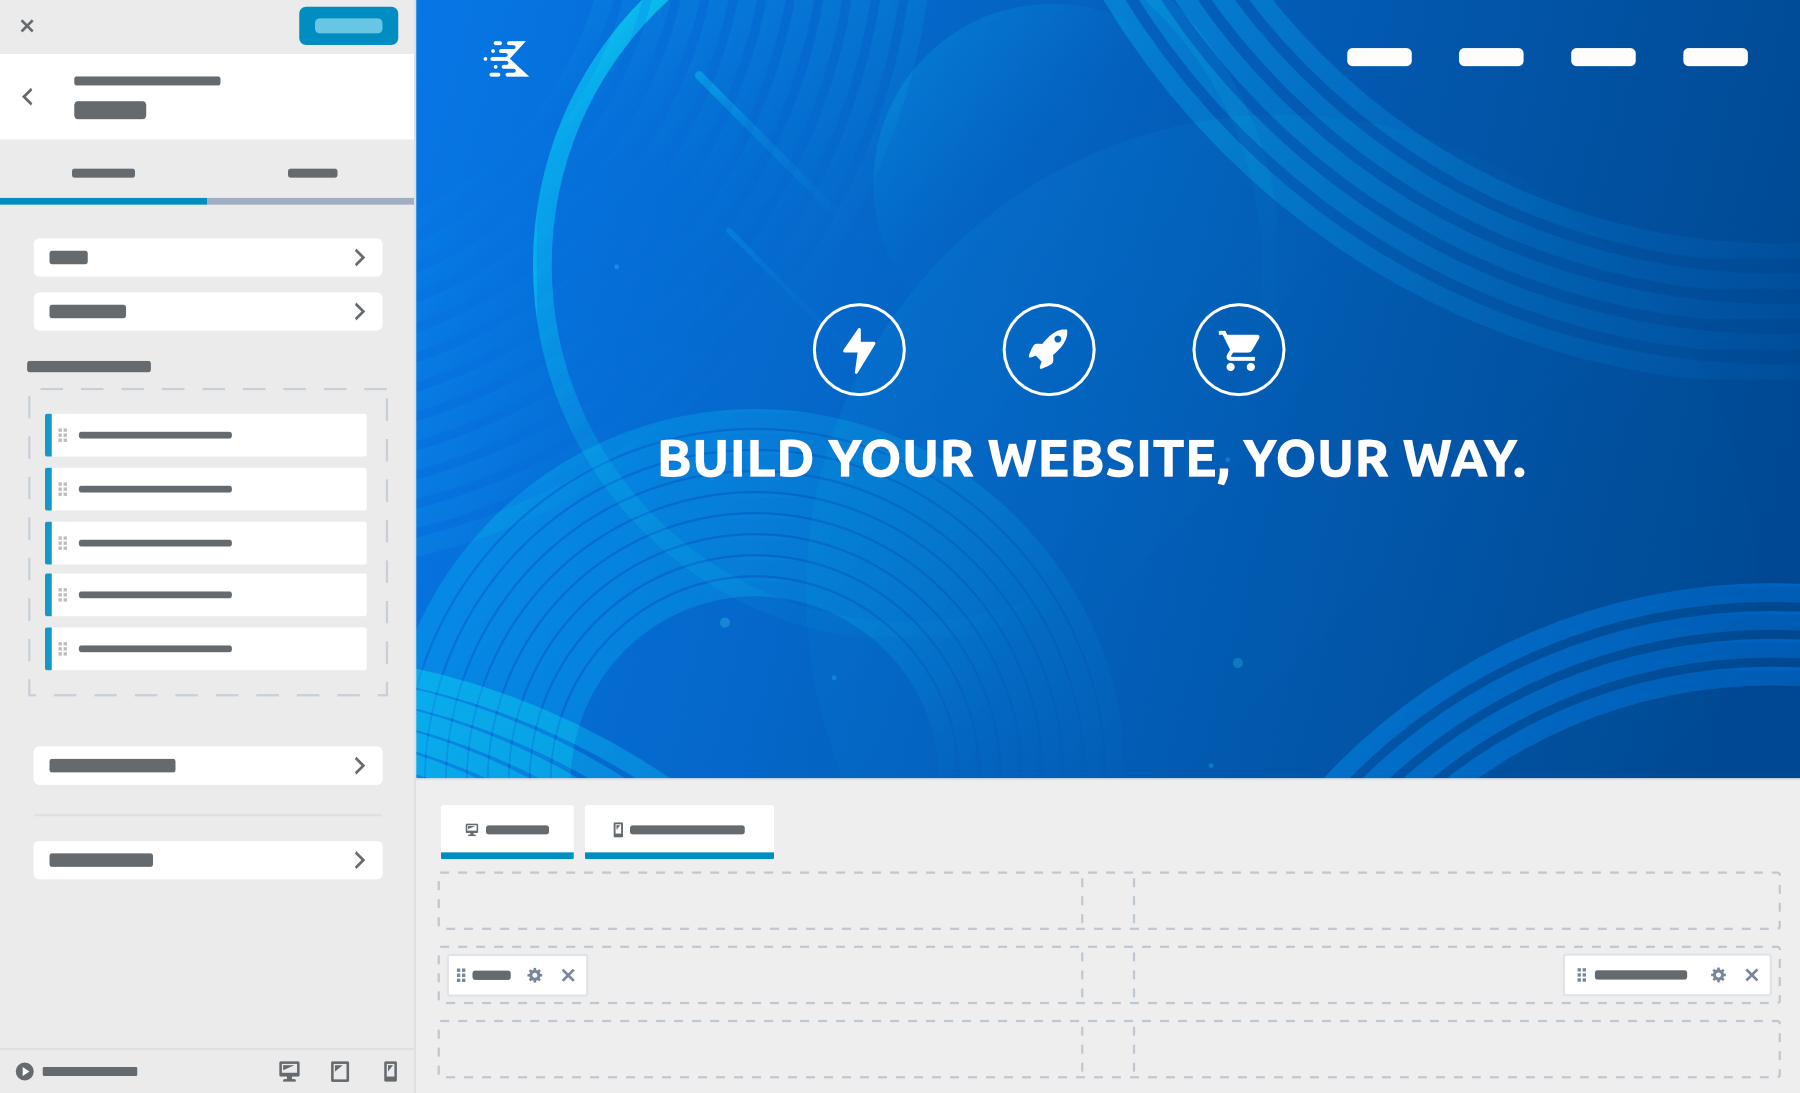 Kadence Free WordPress Theme - Build your website, your way.